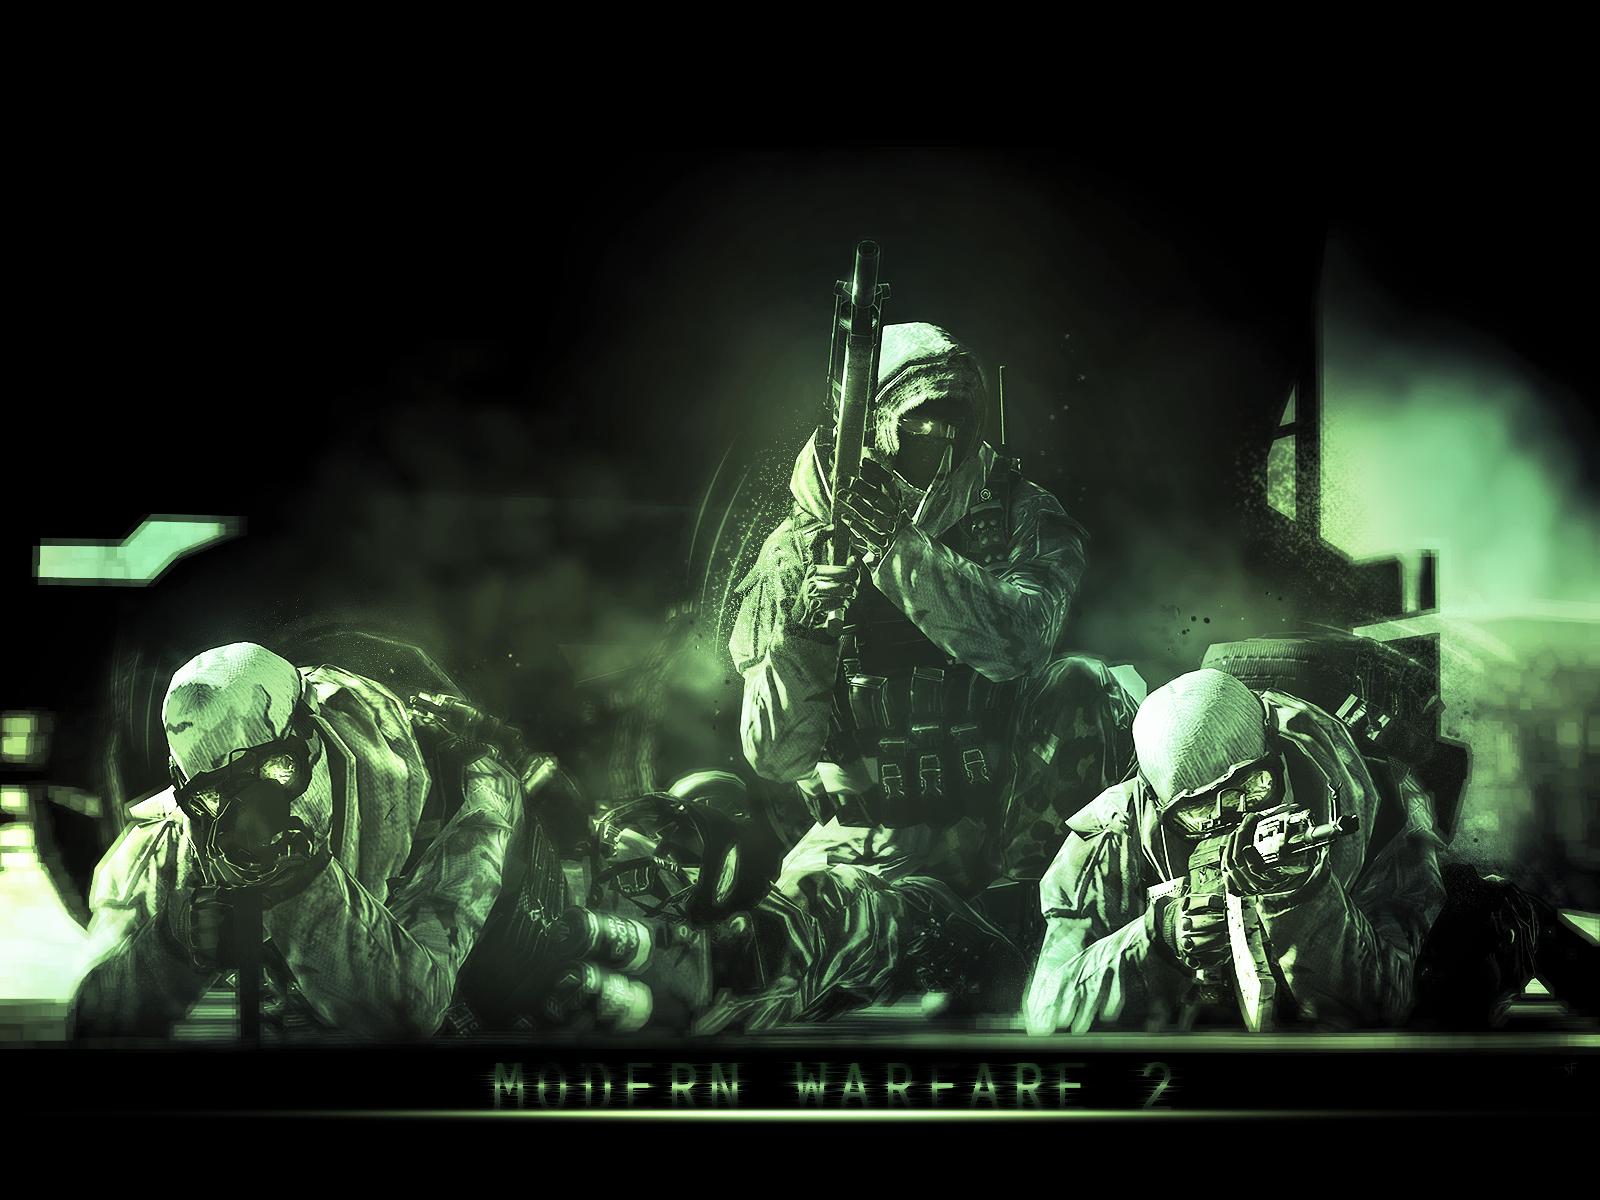 http://4.bp.blogspot.com/_QU8E4UZC7k4/TFbHiNLfo3I/AAAAAAAAAEM/5y1ls-tRVpU/s1600/Modern_Warfare_2_Wallpaper_by_boozerguy47.png